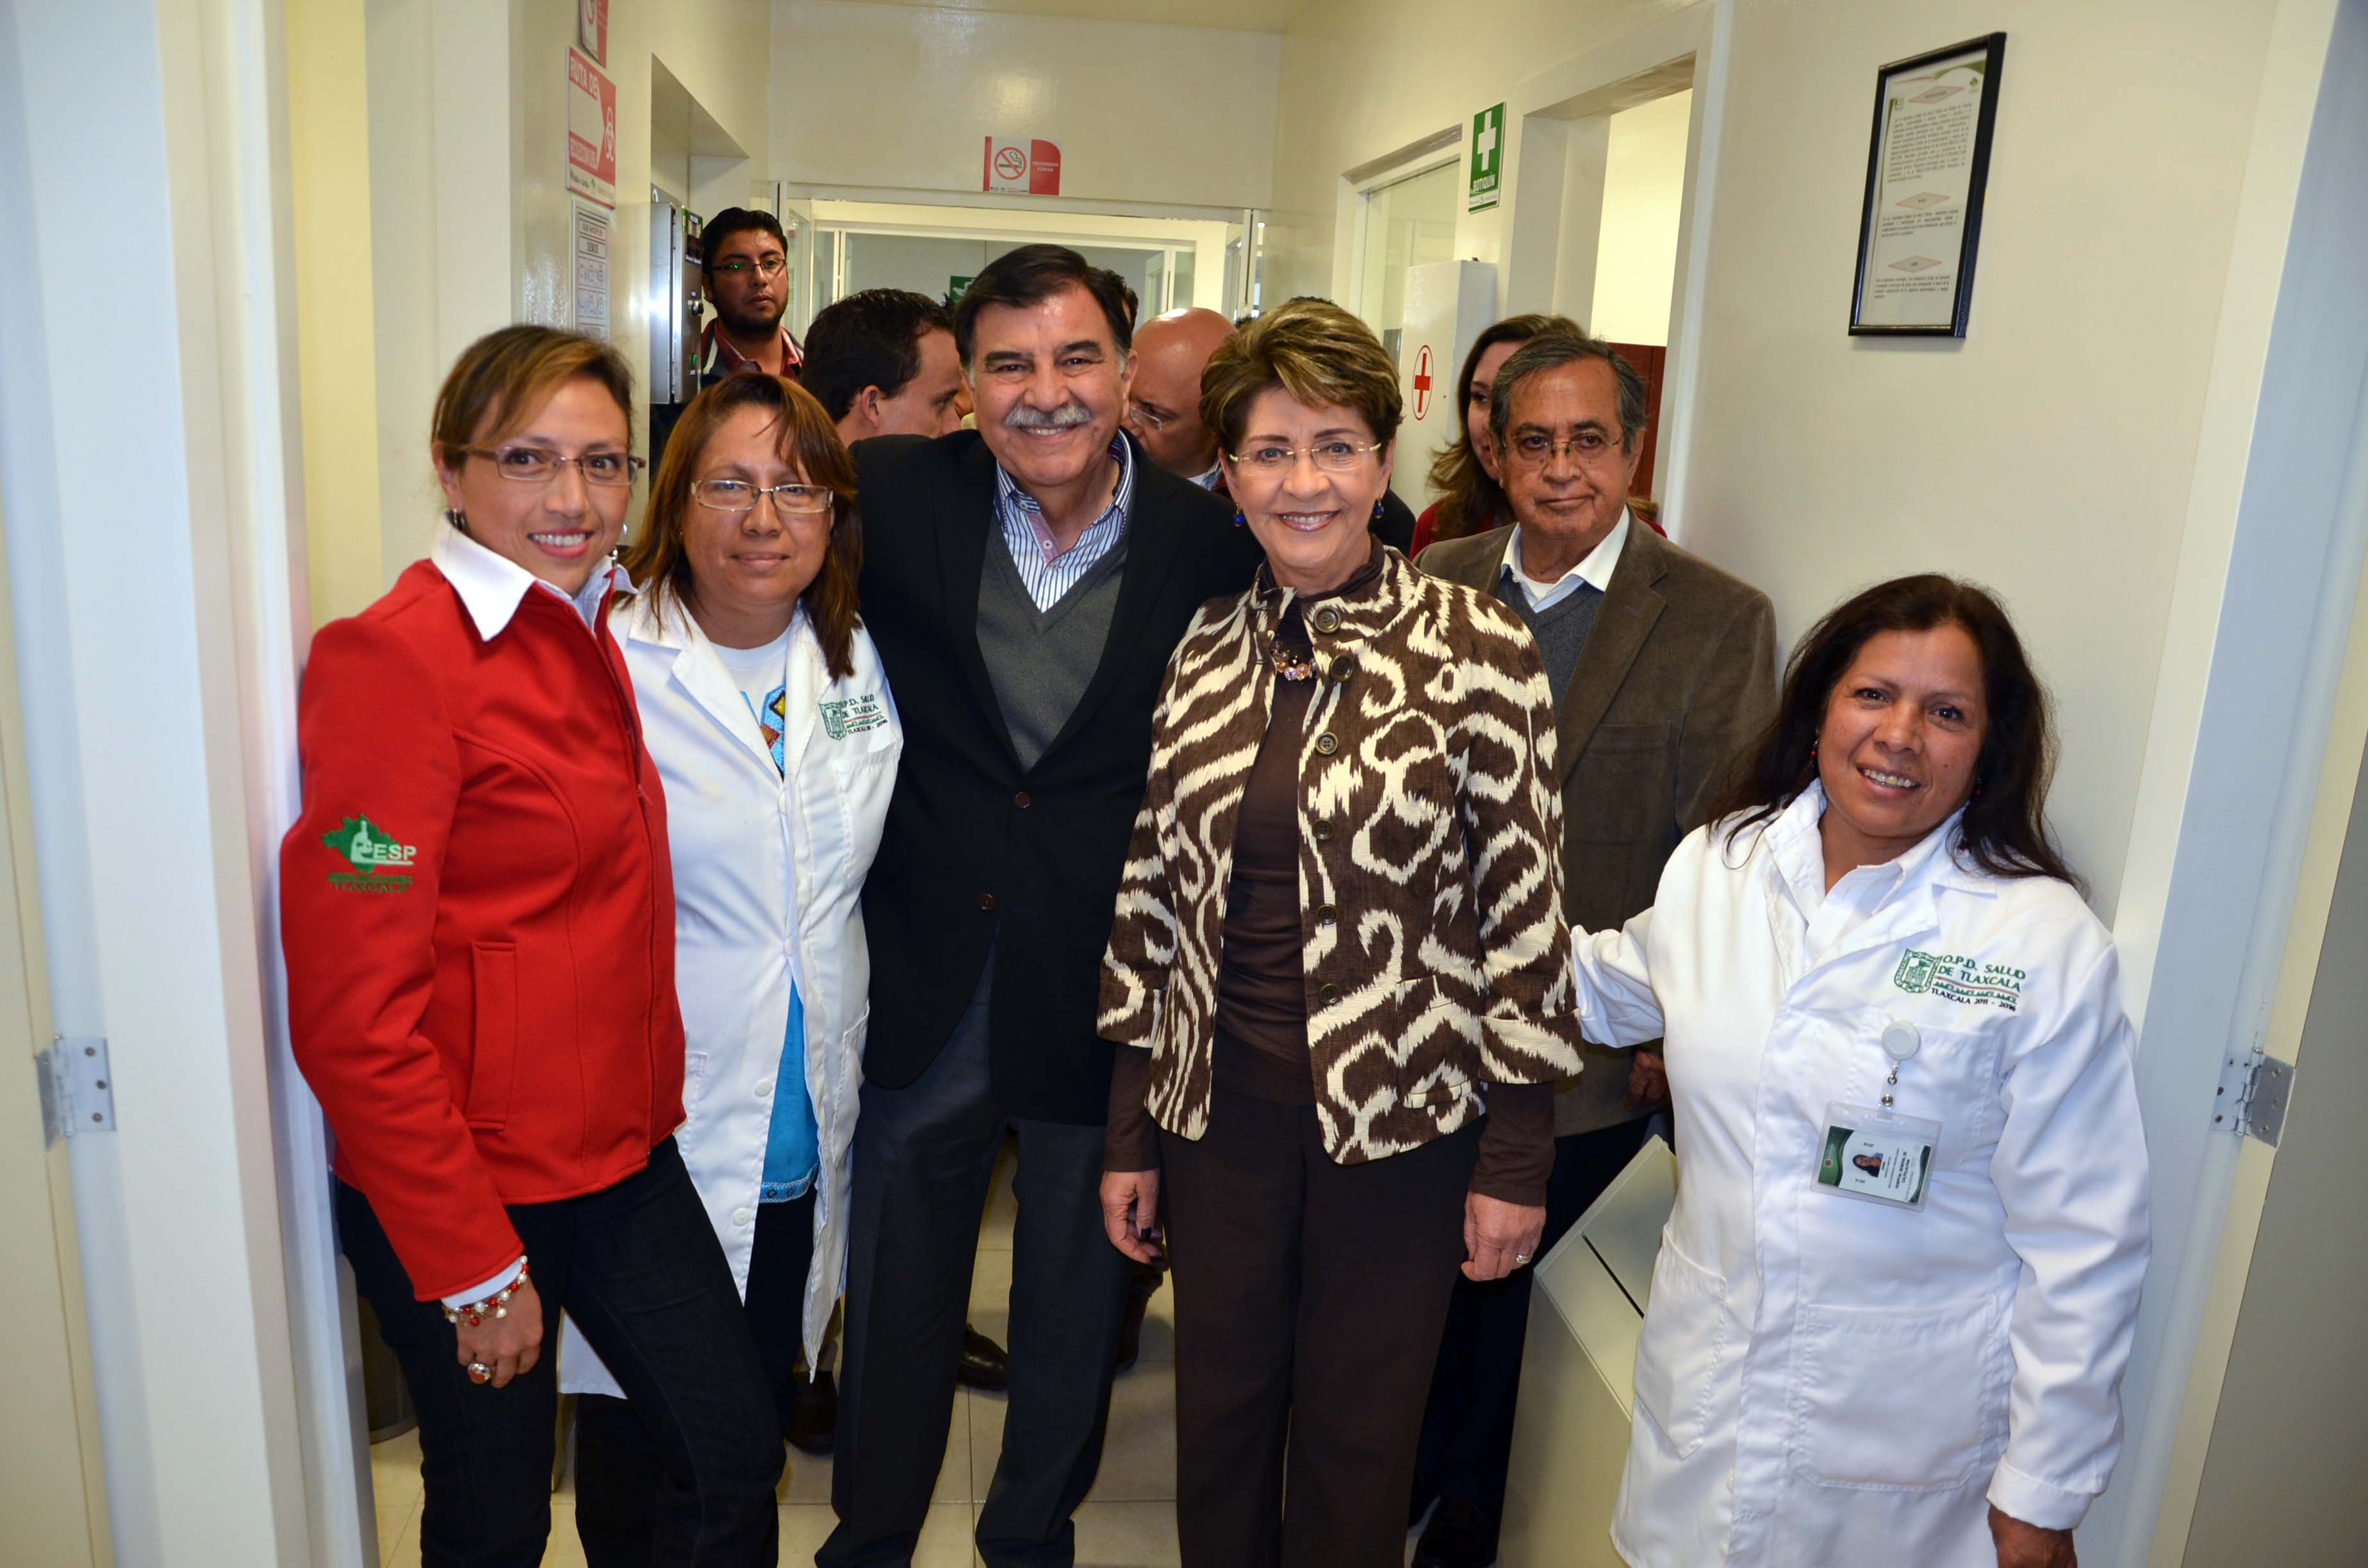 030215 Inauguraciu00F3n del Laboratorio Estatal de Salud   Publica 06jpg